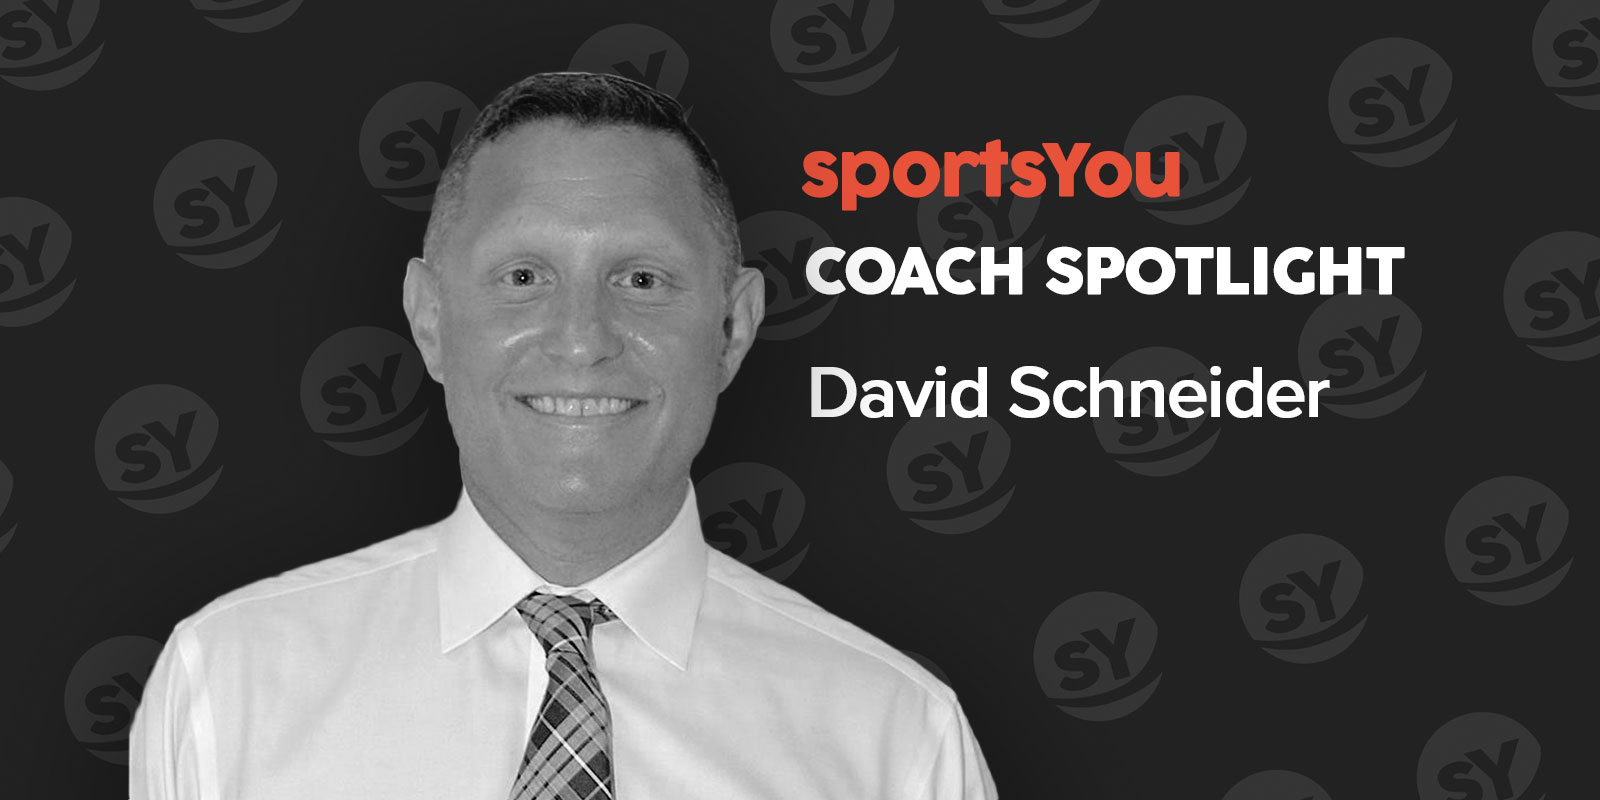 sportsYou Coach Spotlight: Q&A with Coach David Schneider - Photo by sportsYou Photography